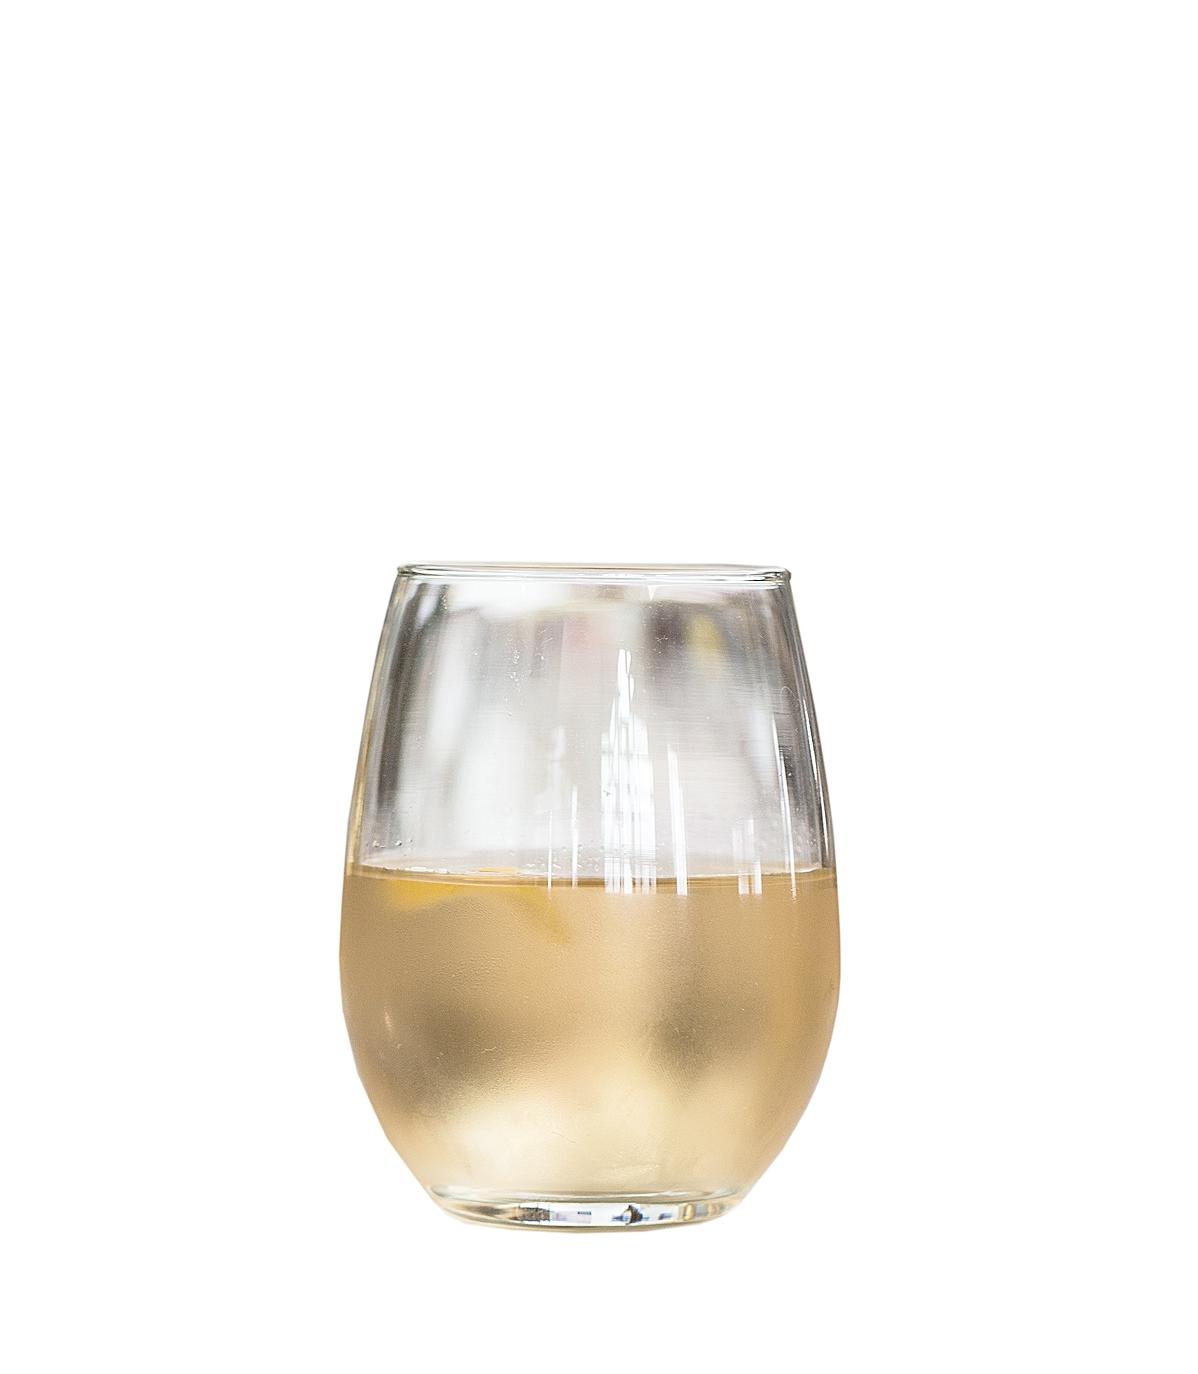 ALASKA  4ml Orange Bitters 20ml Norseman Yellowstone 60ml Norseman Gin  Stir on ice and strain into a stemless wine glass. Garnish with a small orange coin.